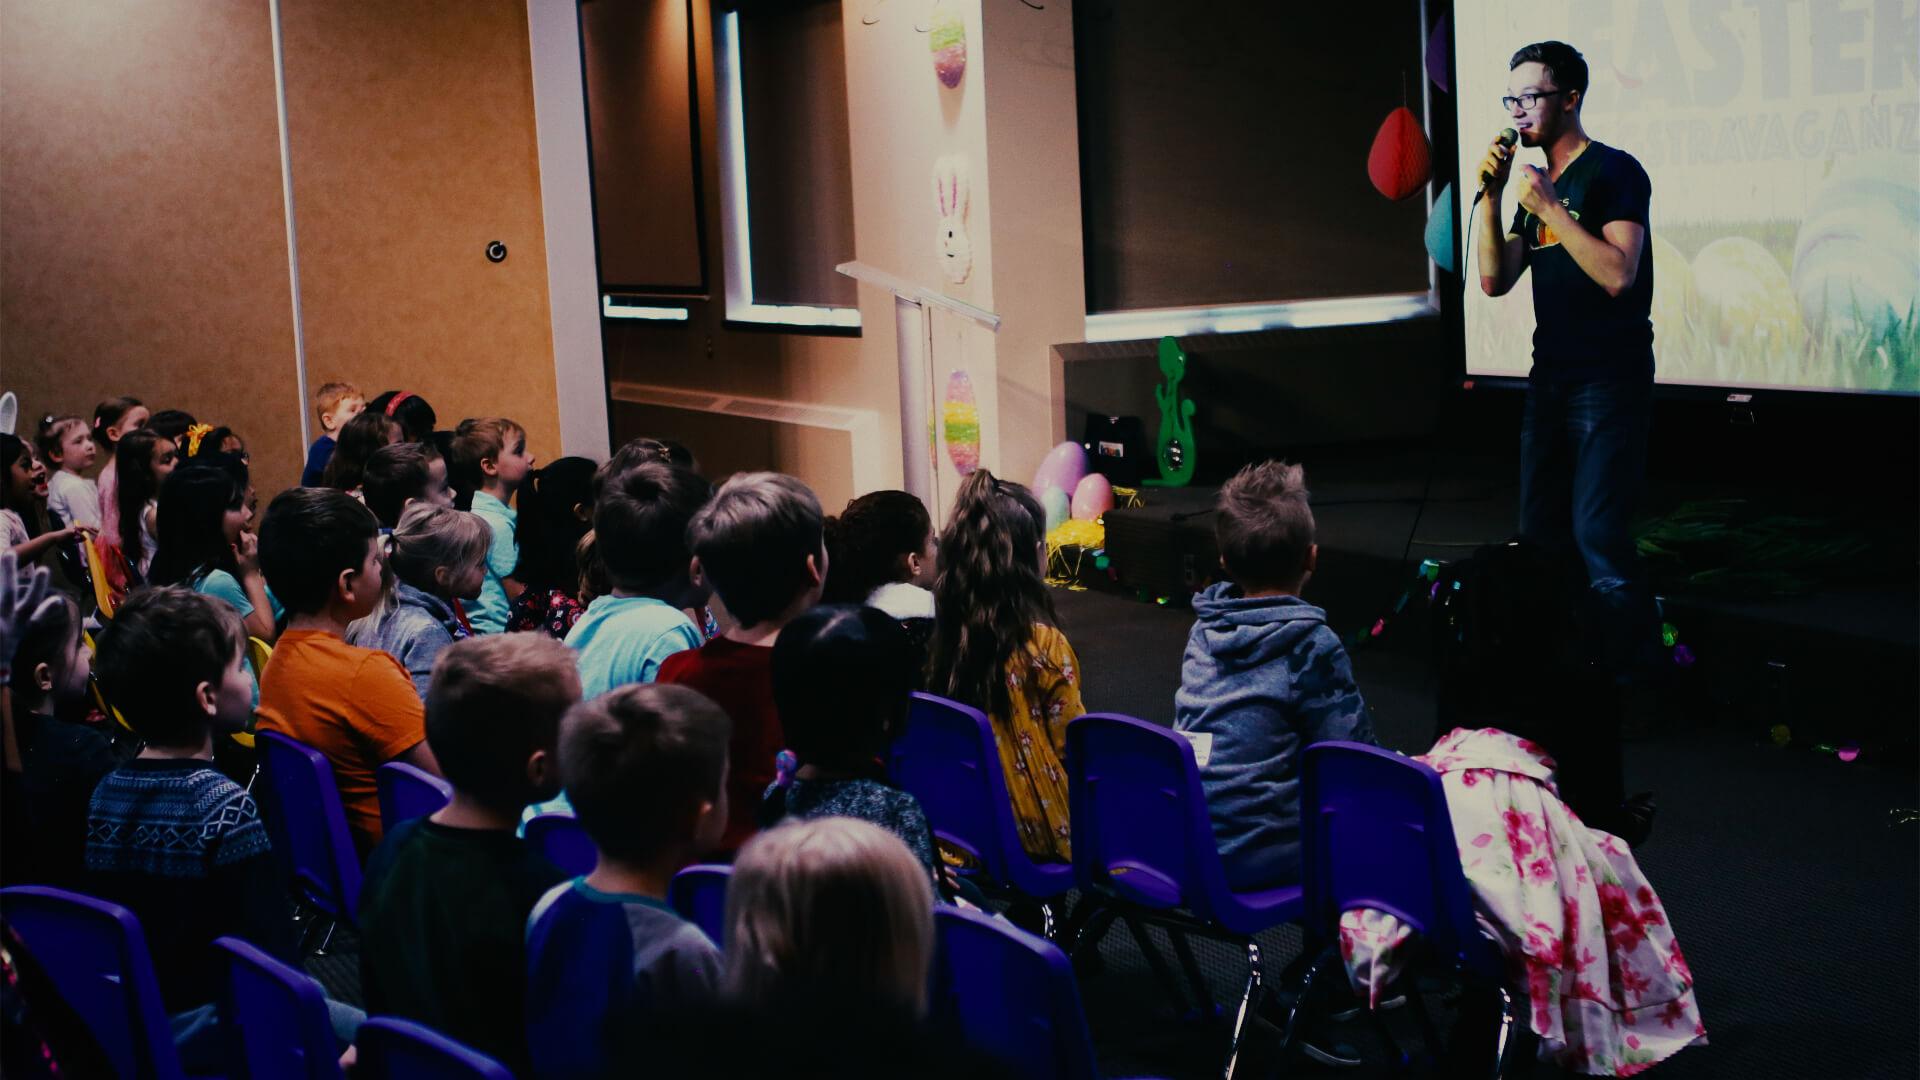 Springs Church Winnipeg for Kids - For 4 months through 6th grade